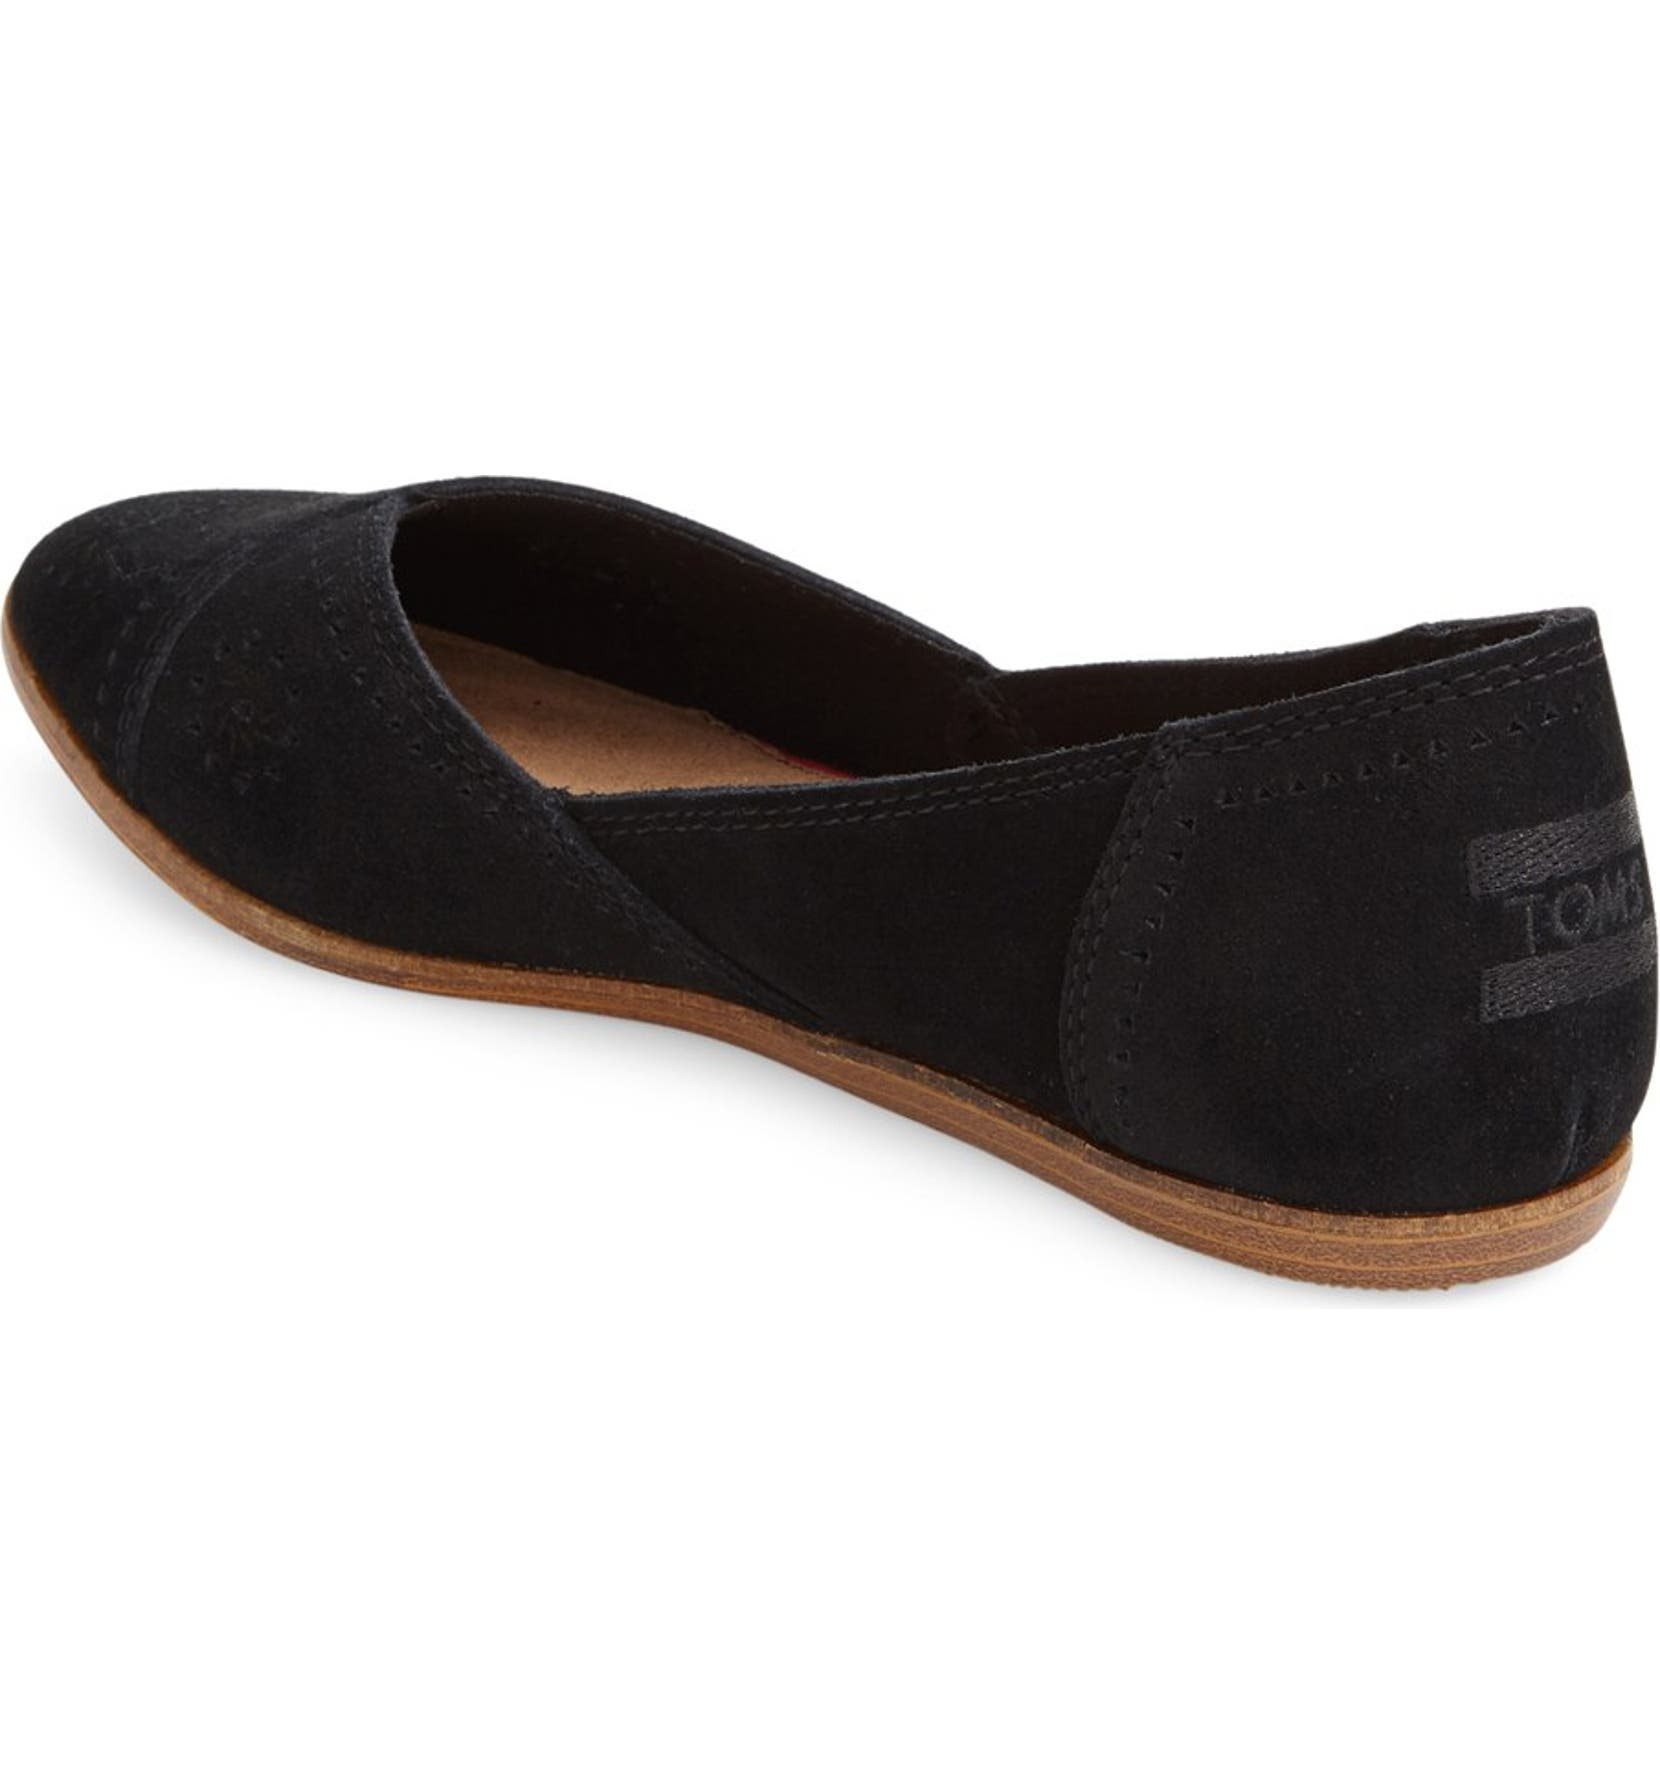 c62762c49b5 TOMS  Jutti  Perforated Pointy Toe Flat (Women)